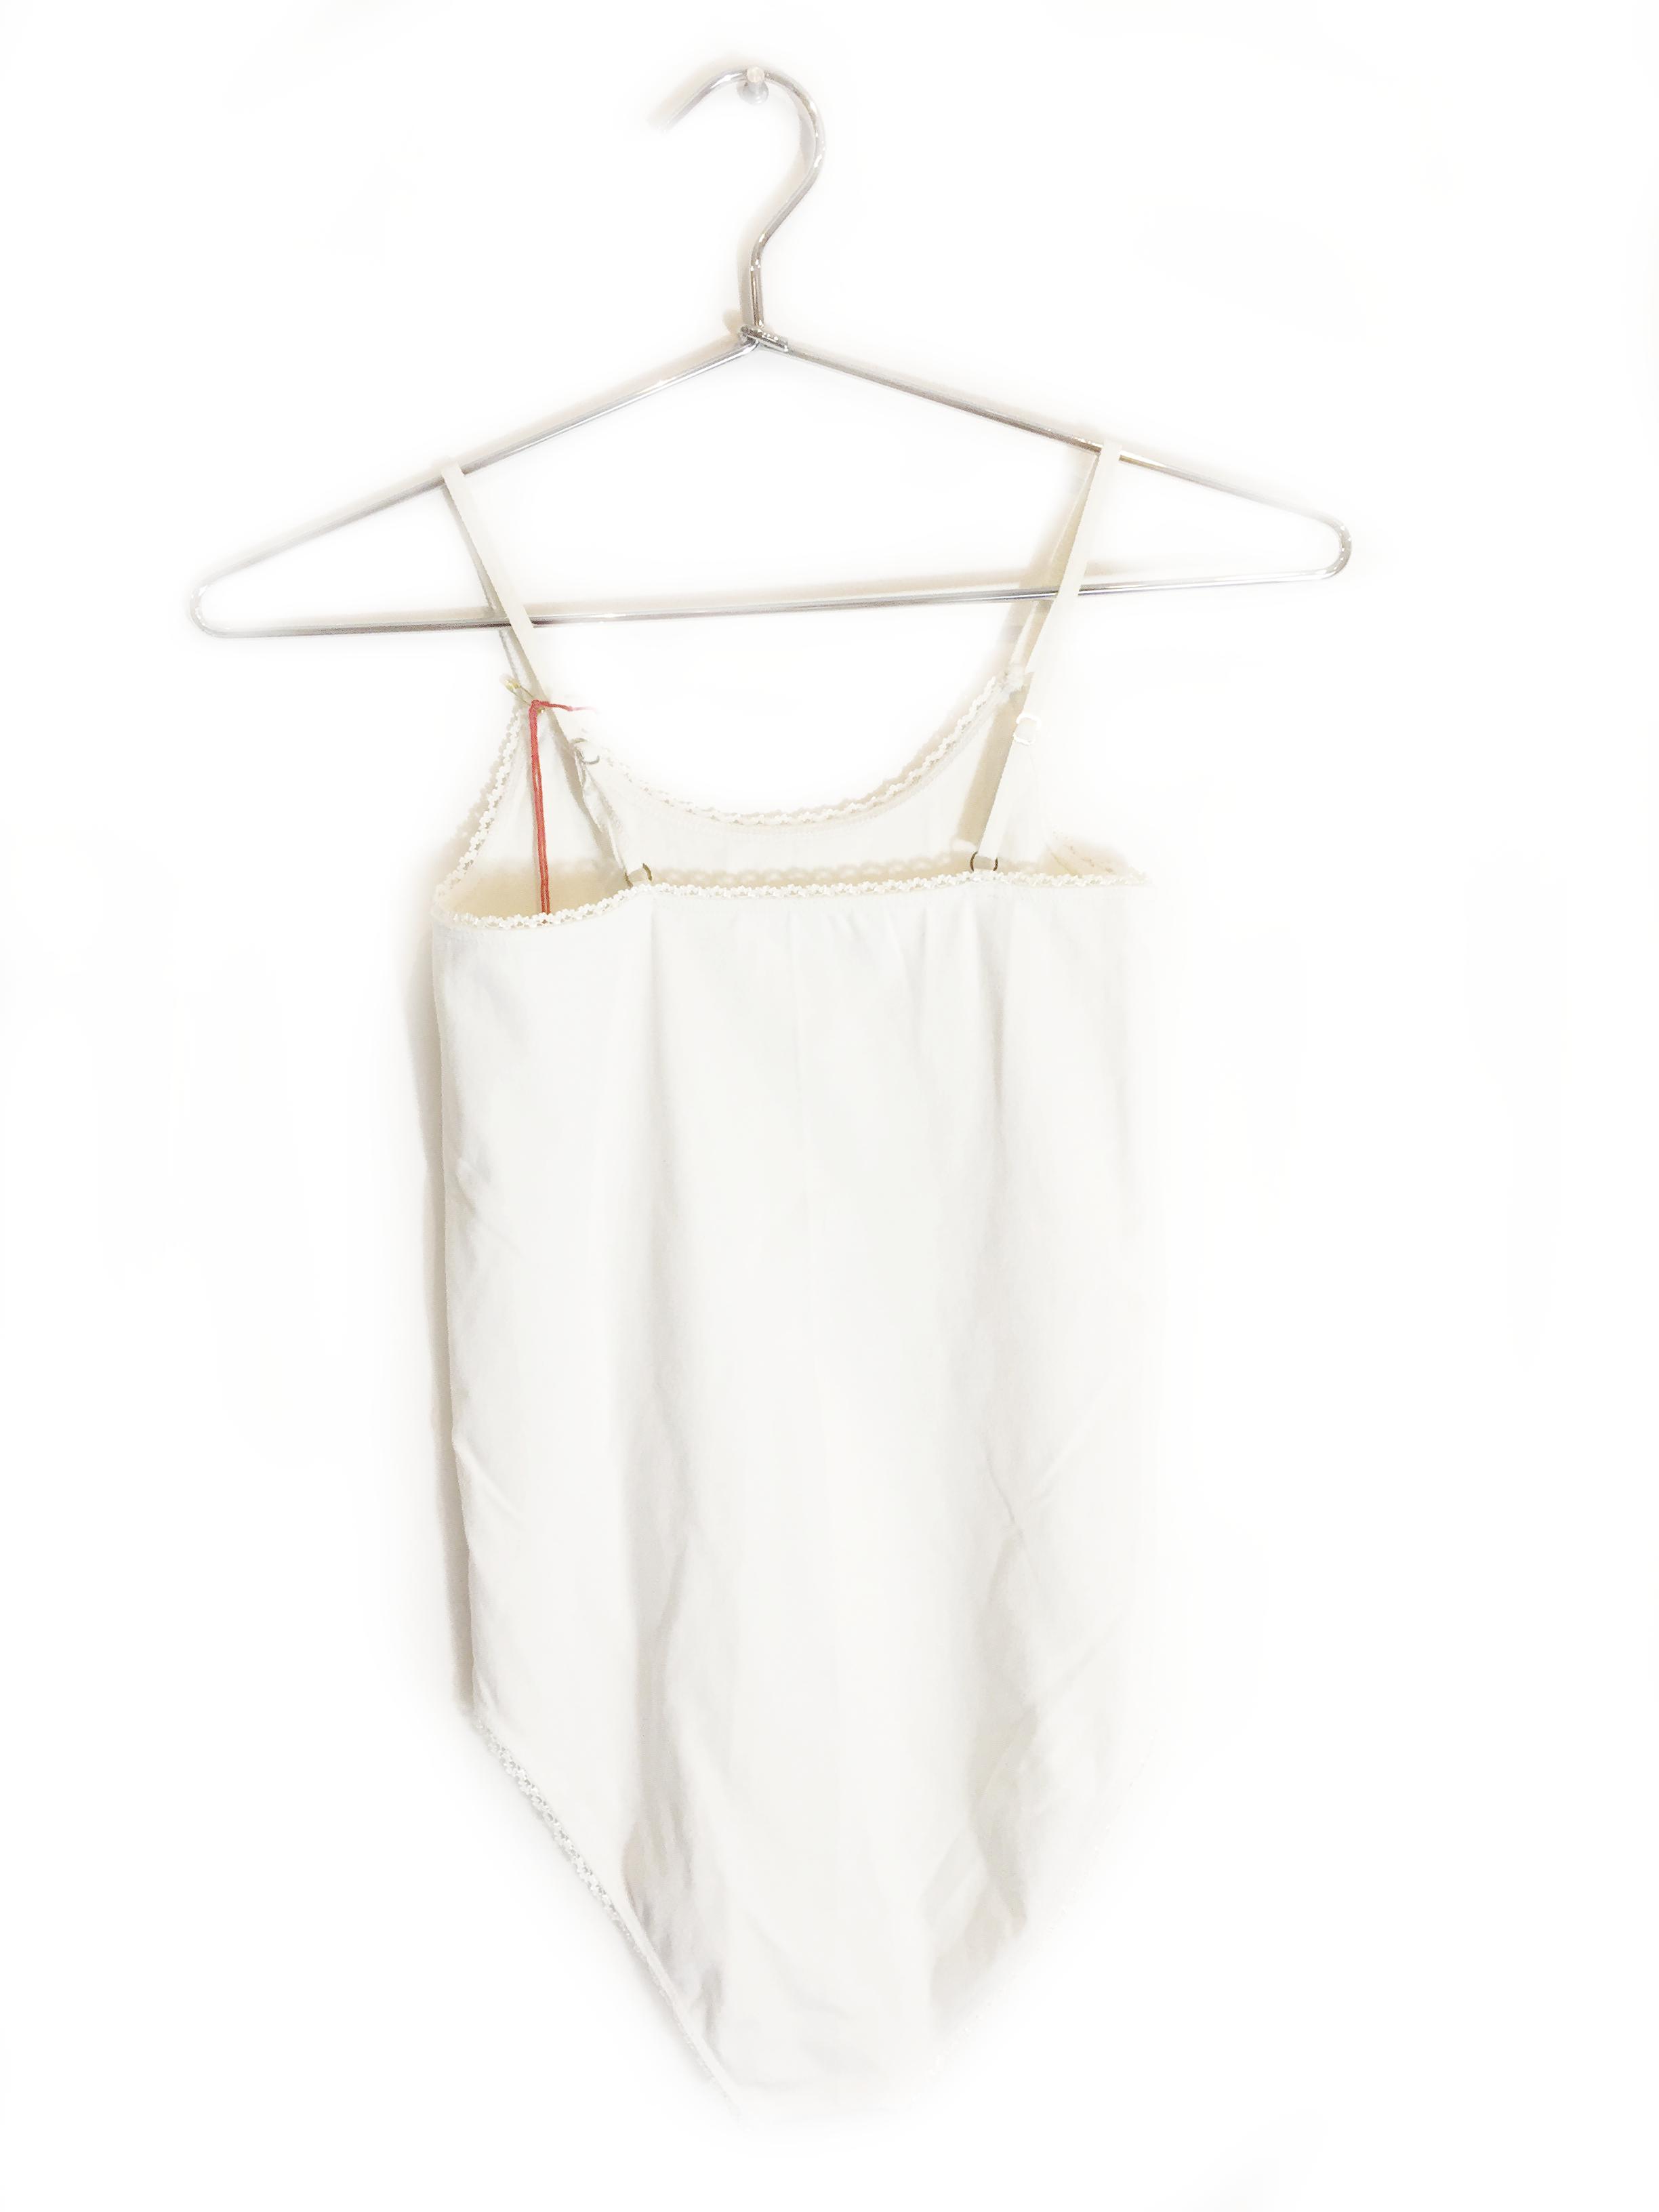 New-Anthropologie-Womens-Seamless-Stretchy-Sleeveless-Bodysuit-Cami-Tank-Top-38 thumbnail 3